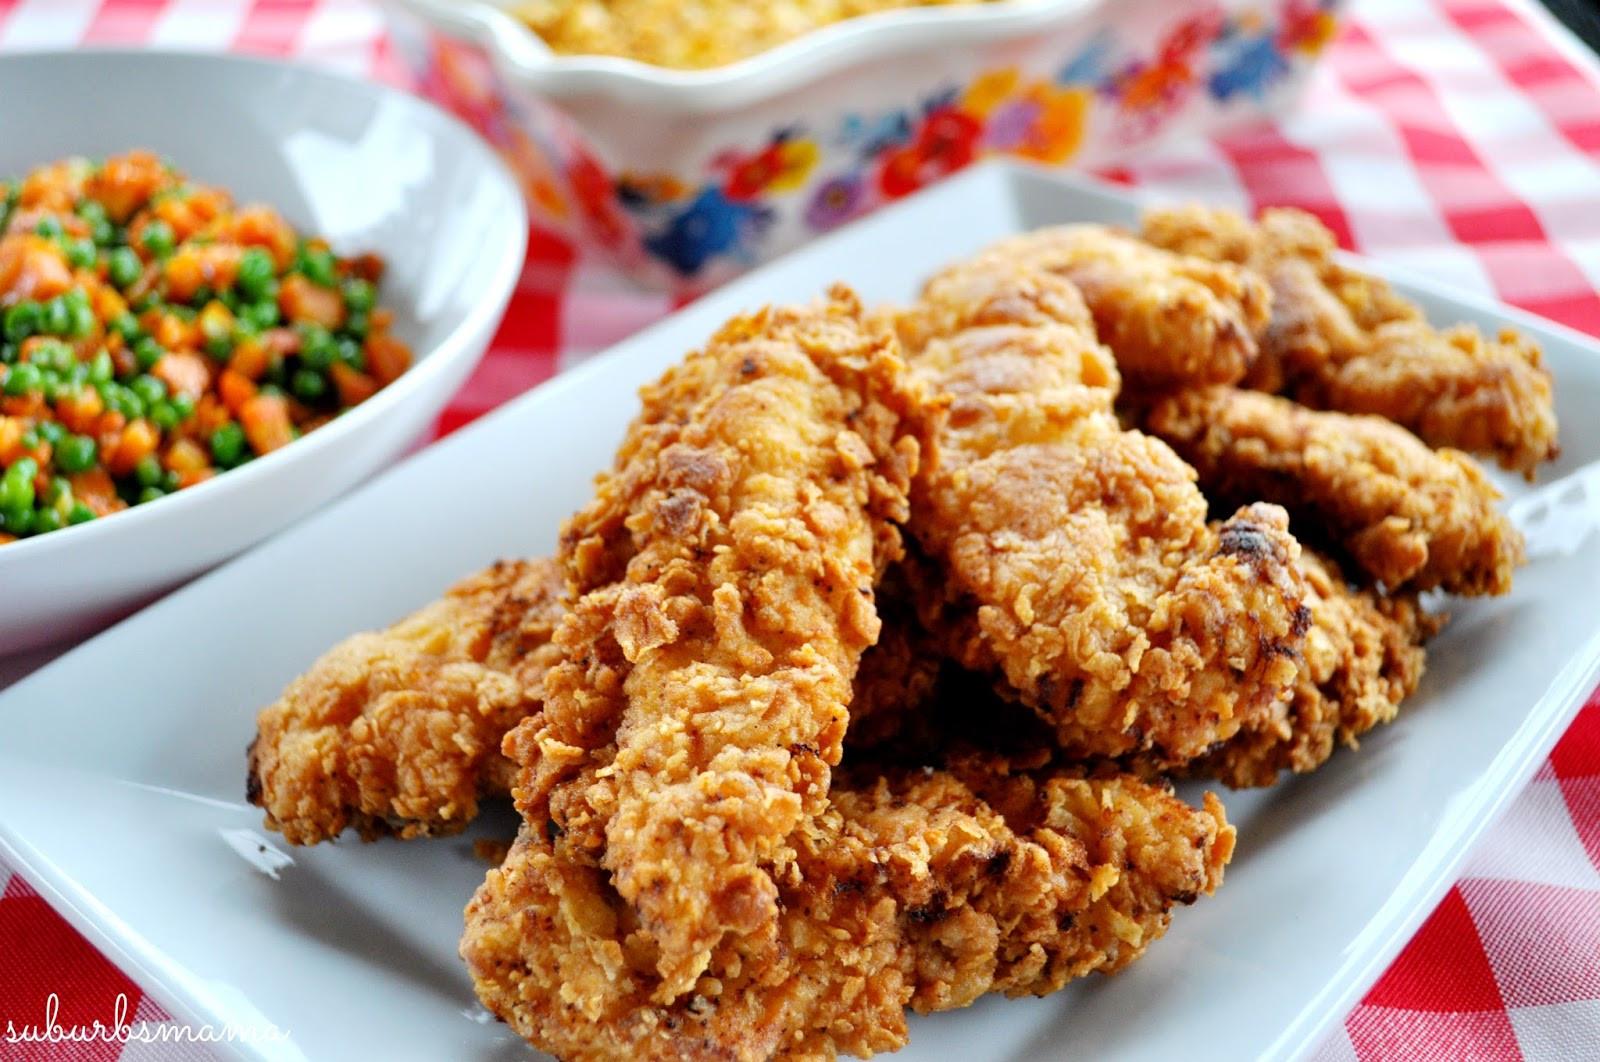 Fried Chicken Tenders  Suburbs Mama Fried Chicken Tenders